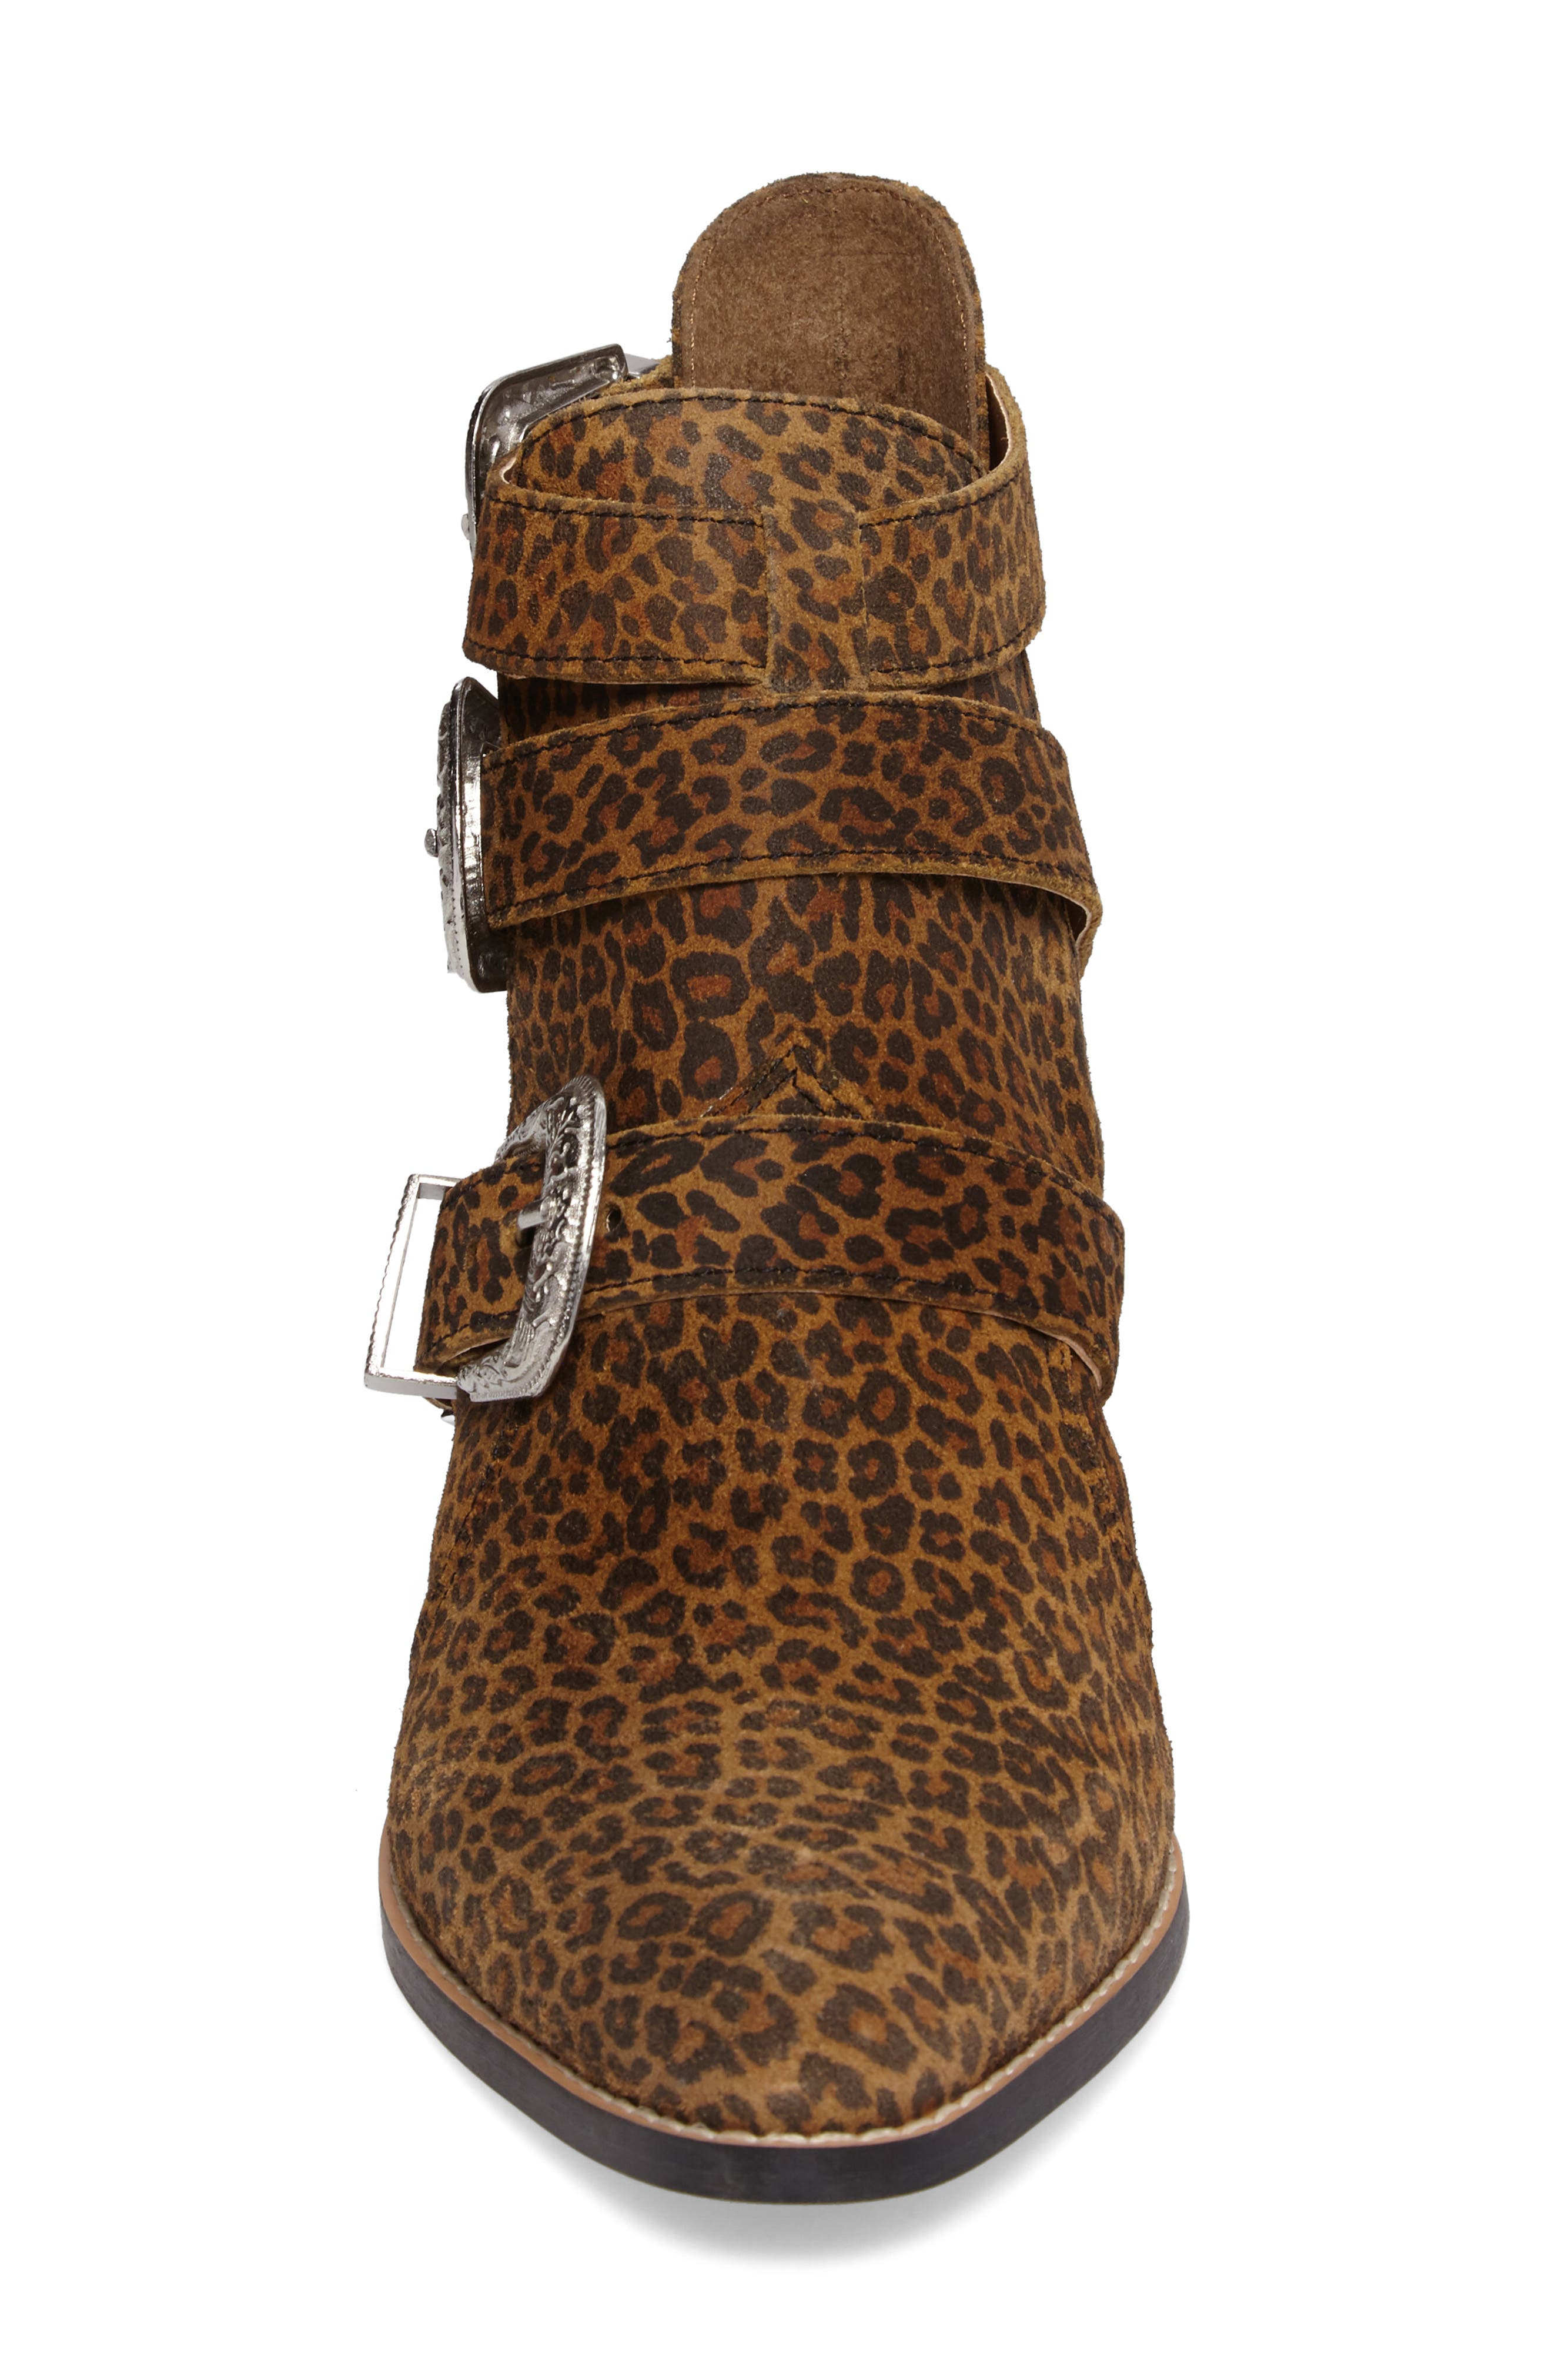 Marmalade Leopard Print Buckle Bootie,                             Alternate thumbnail 4, color,                             Leopard